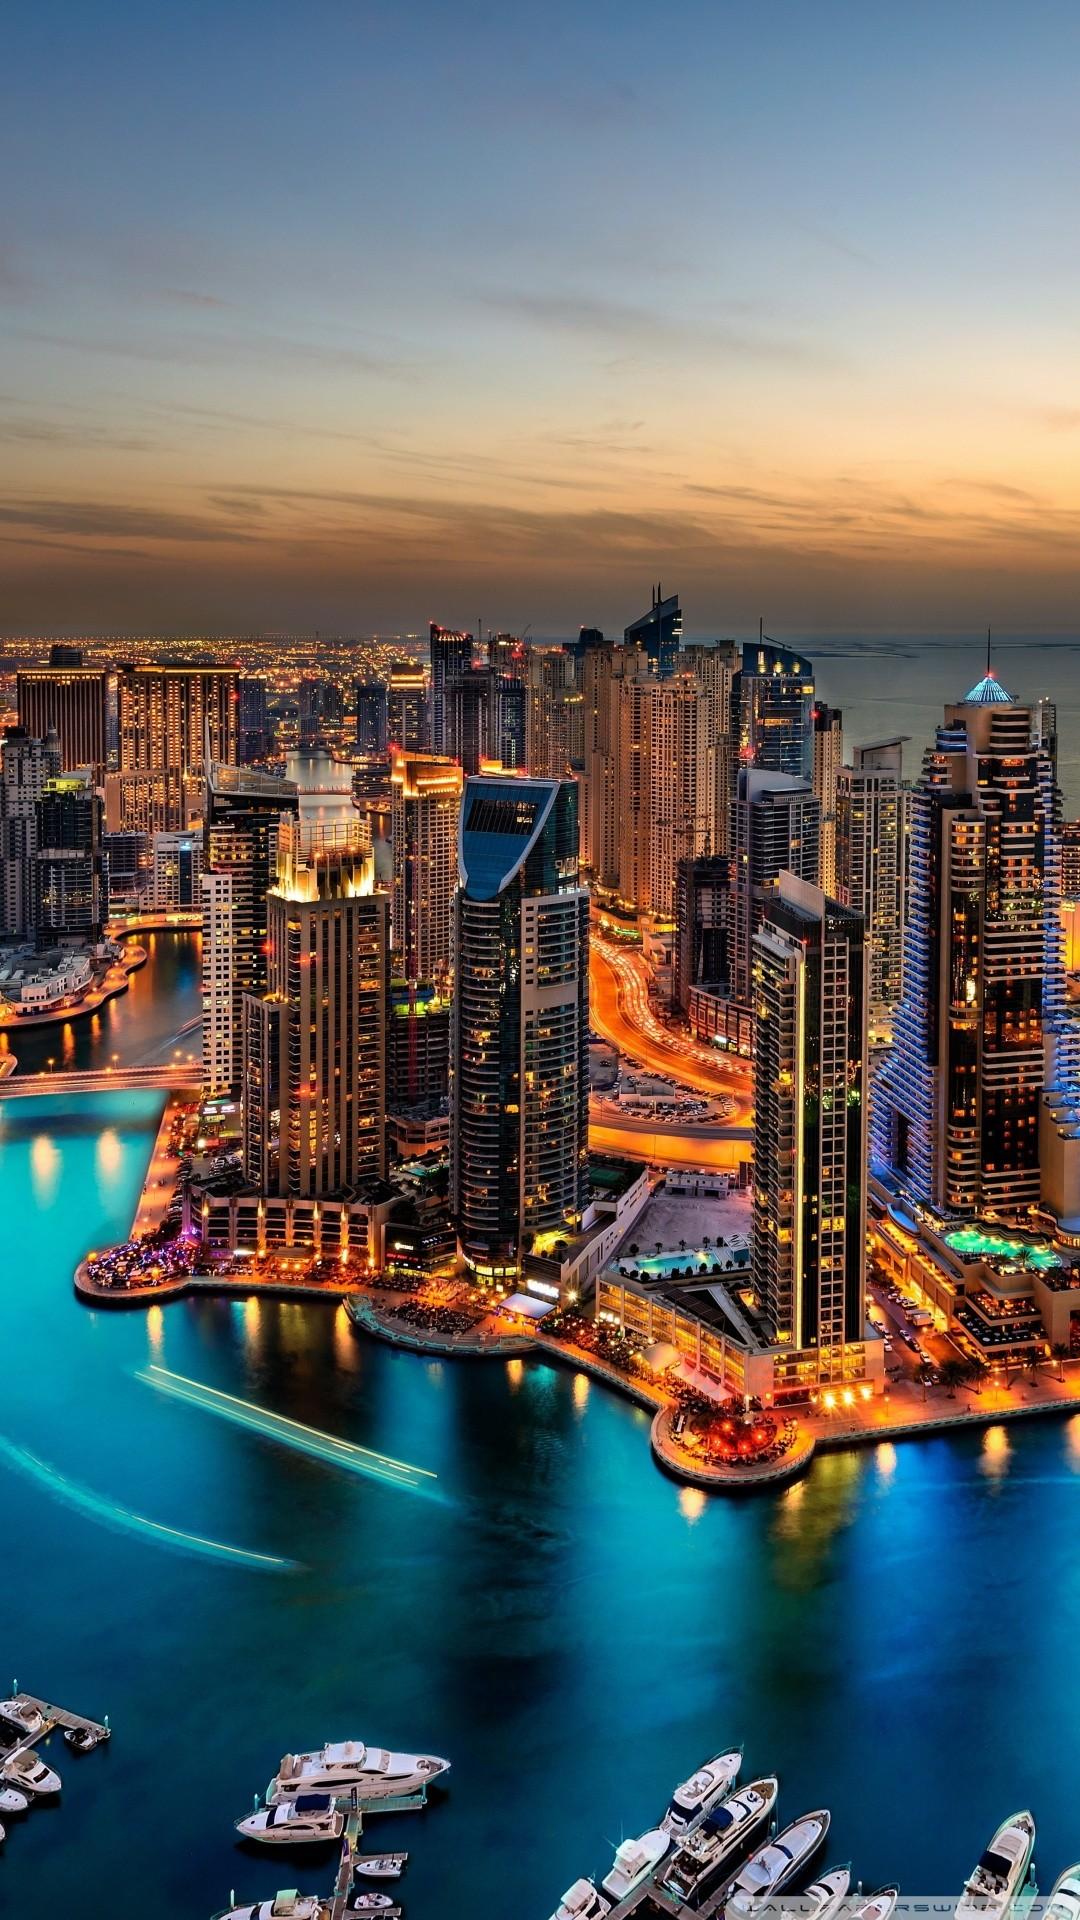 Free Dubai Marina, United Arab Emirates phone wallpaper by melissa472